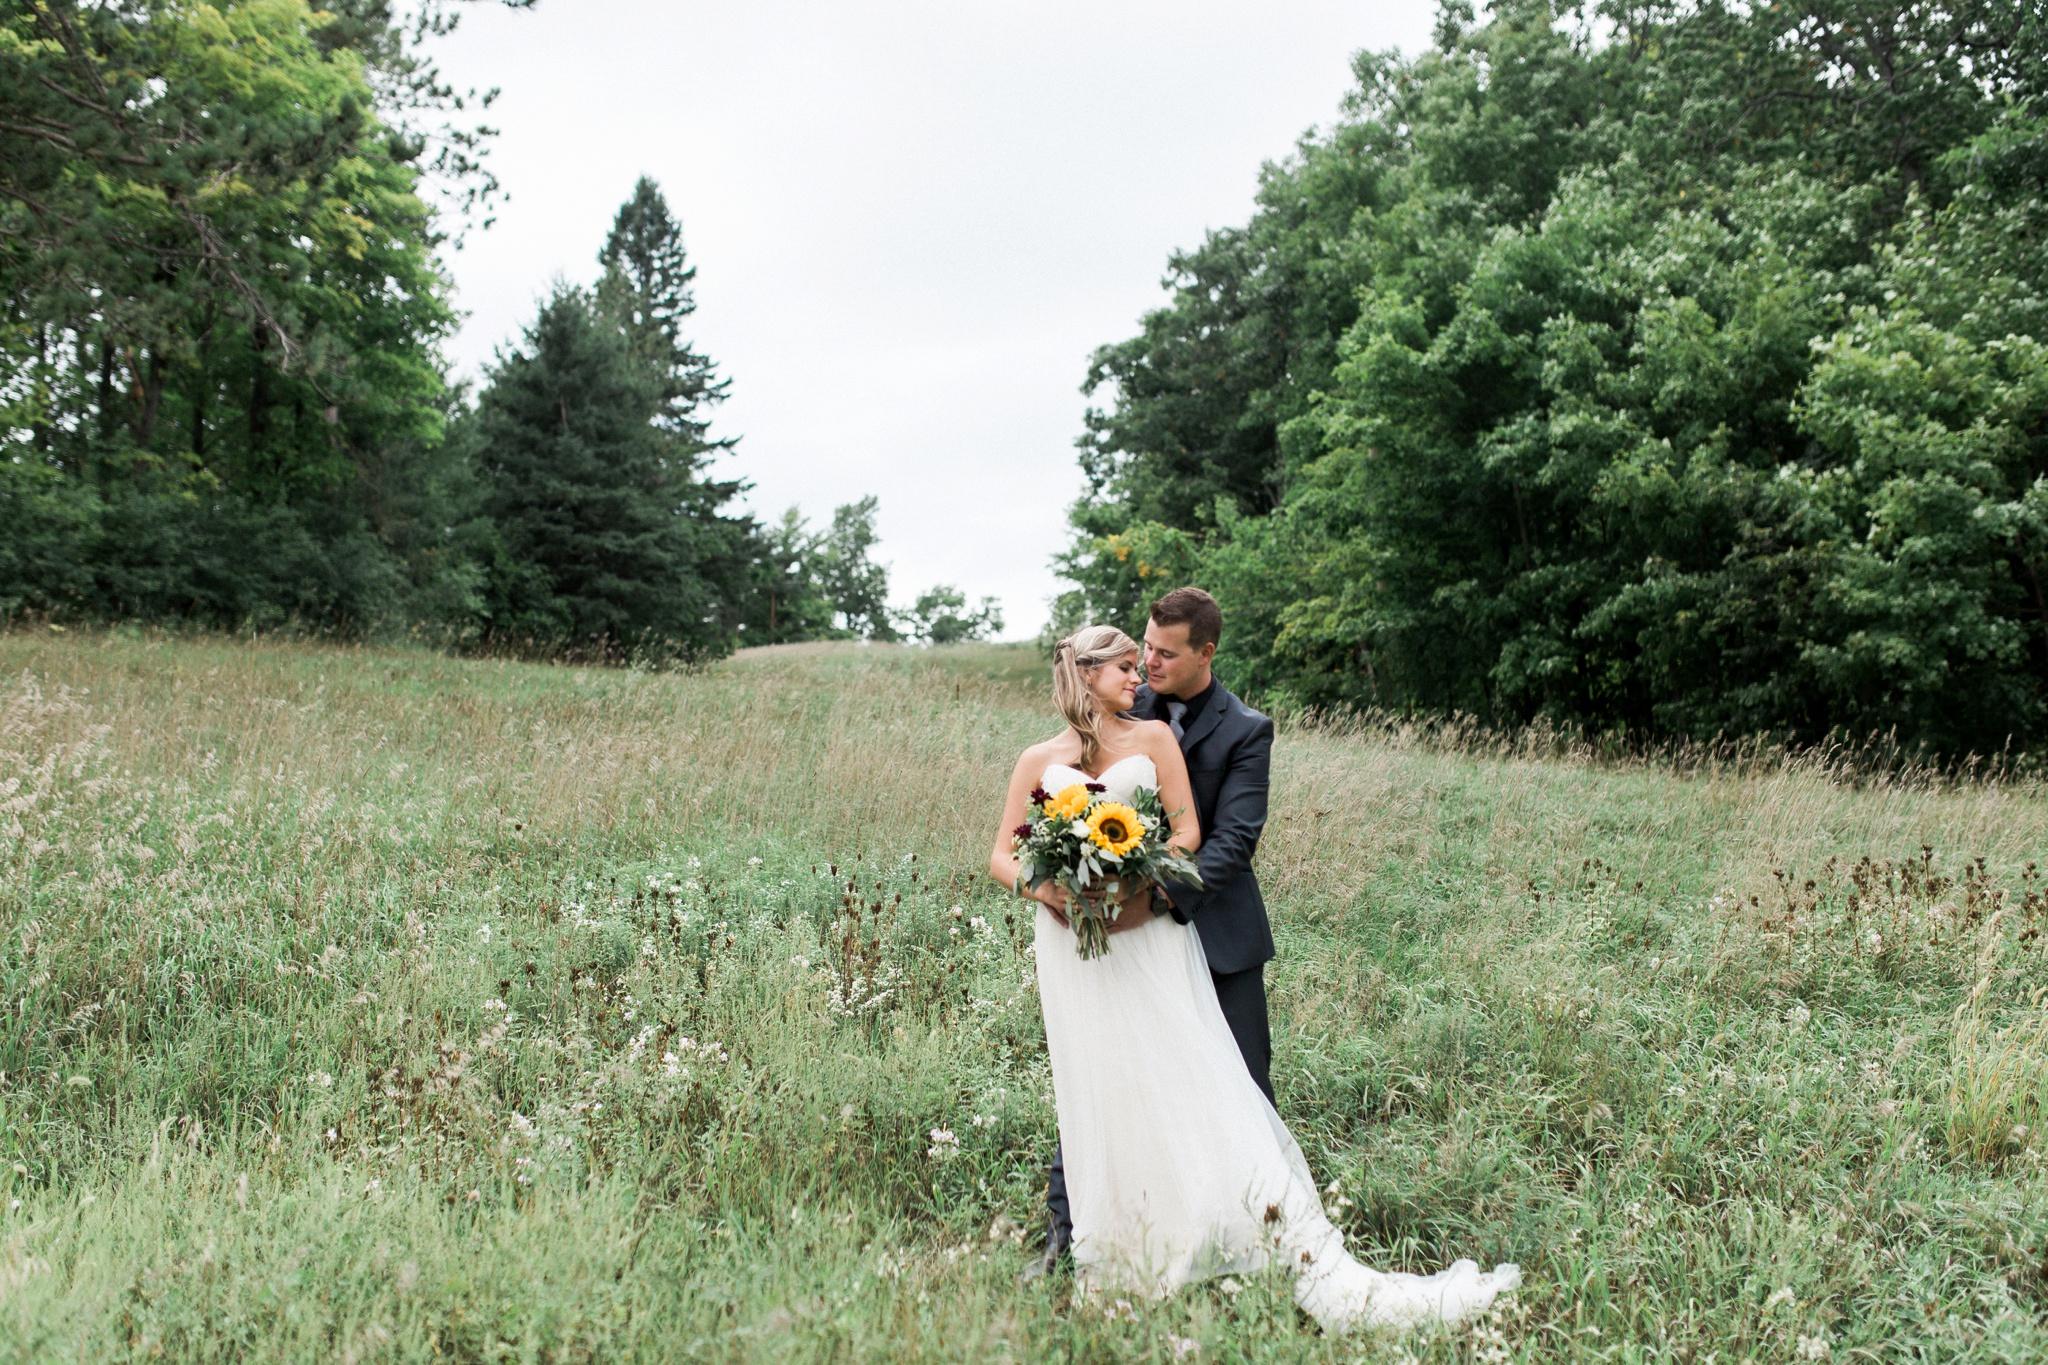 Outdoor Wedding, Sunflower Bouquet